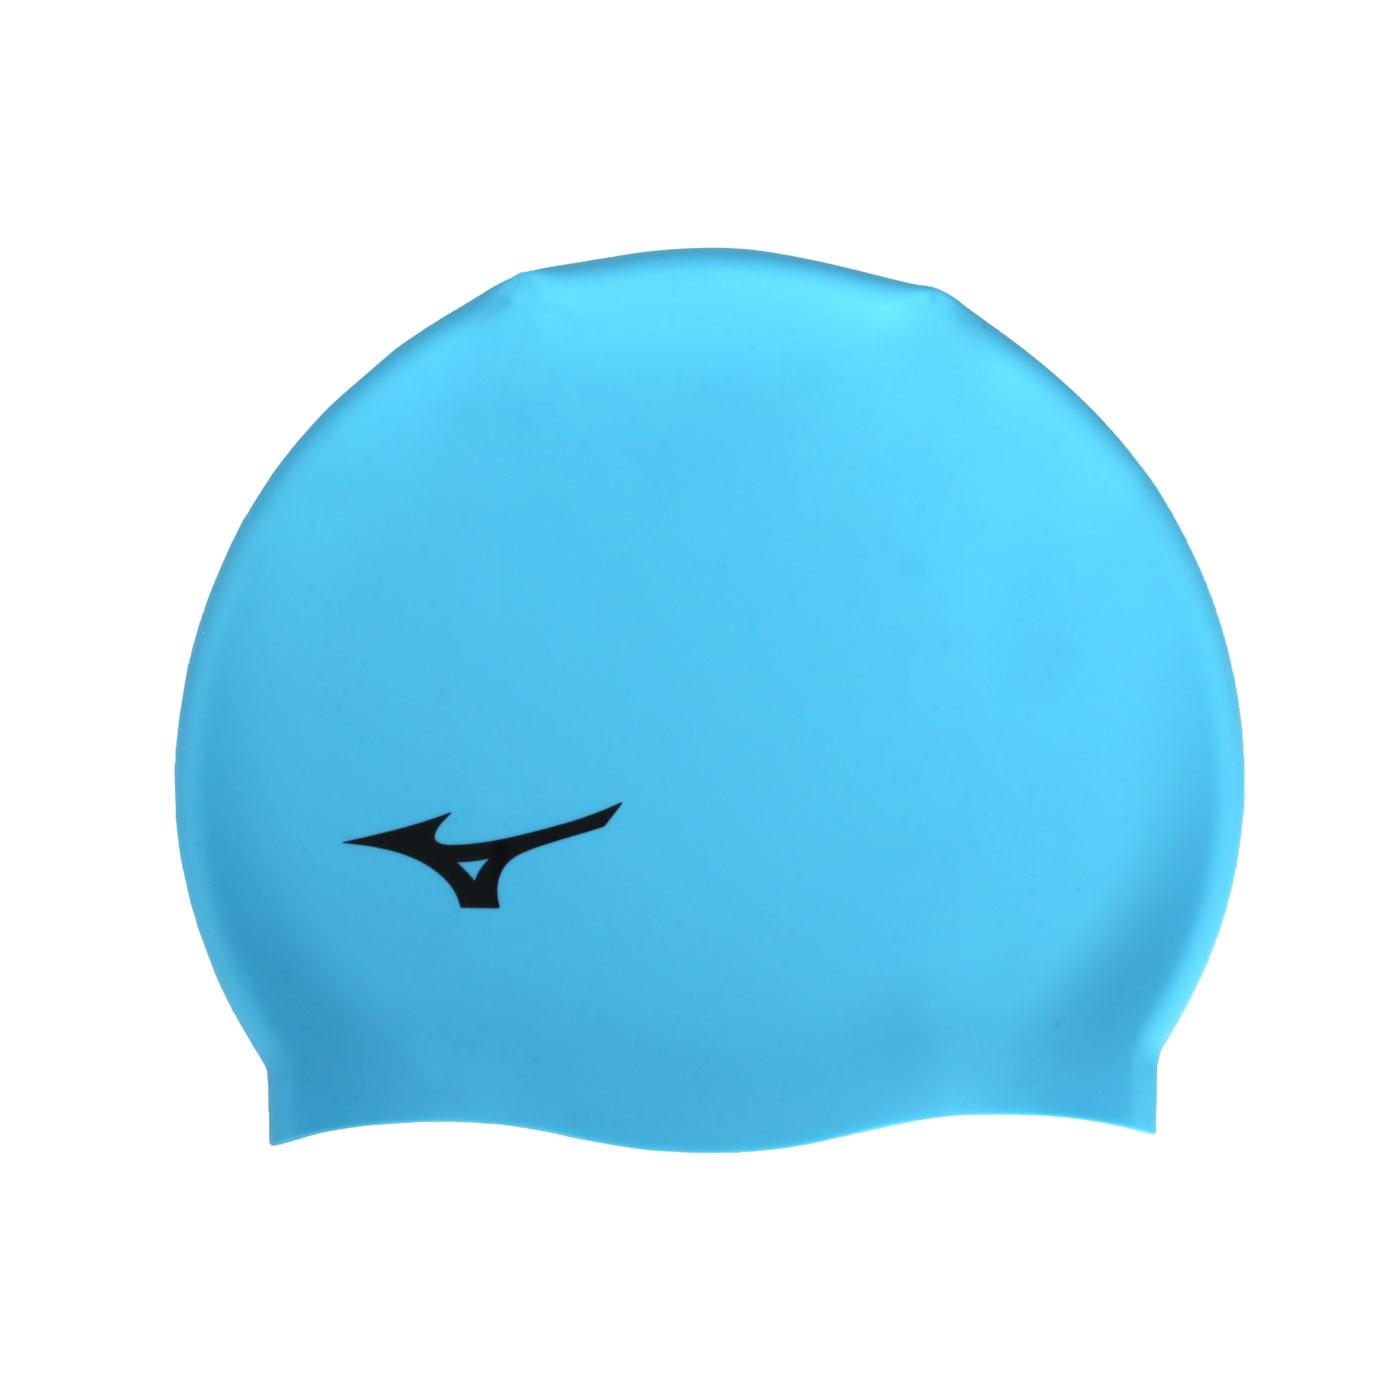 MIZUNO 矽膠泳帽  SWIMN2JW914000-24 - 亮藍黑